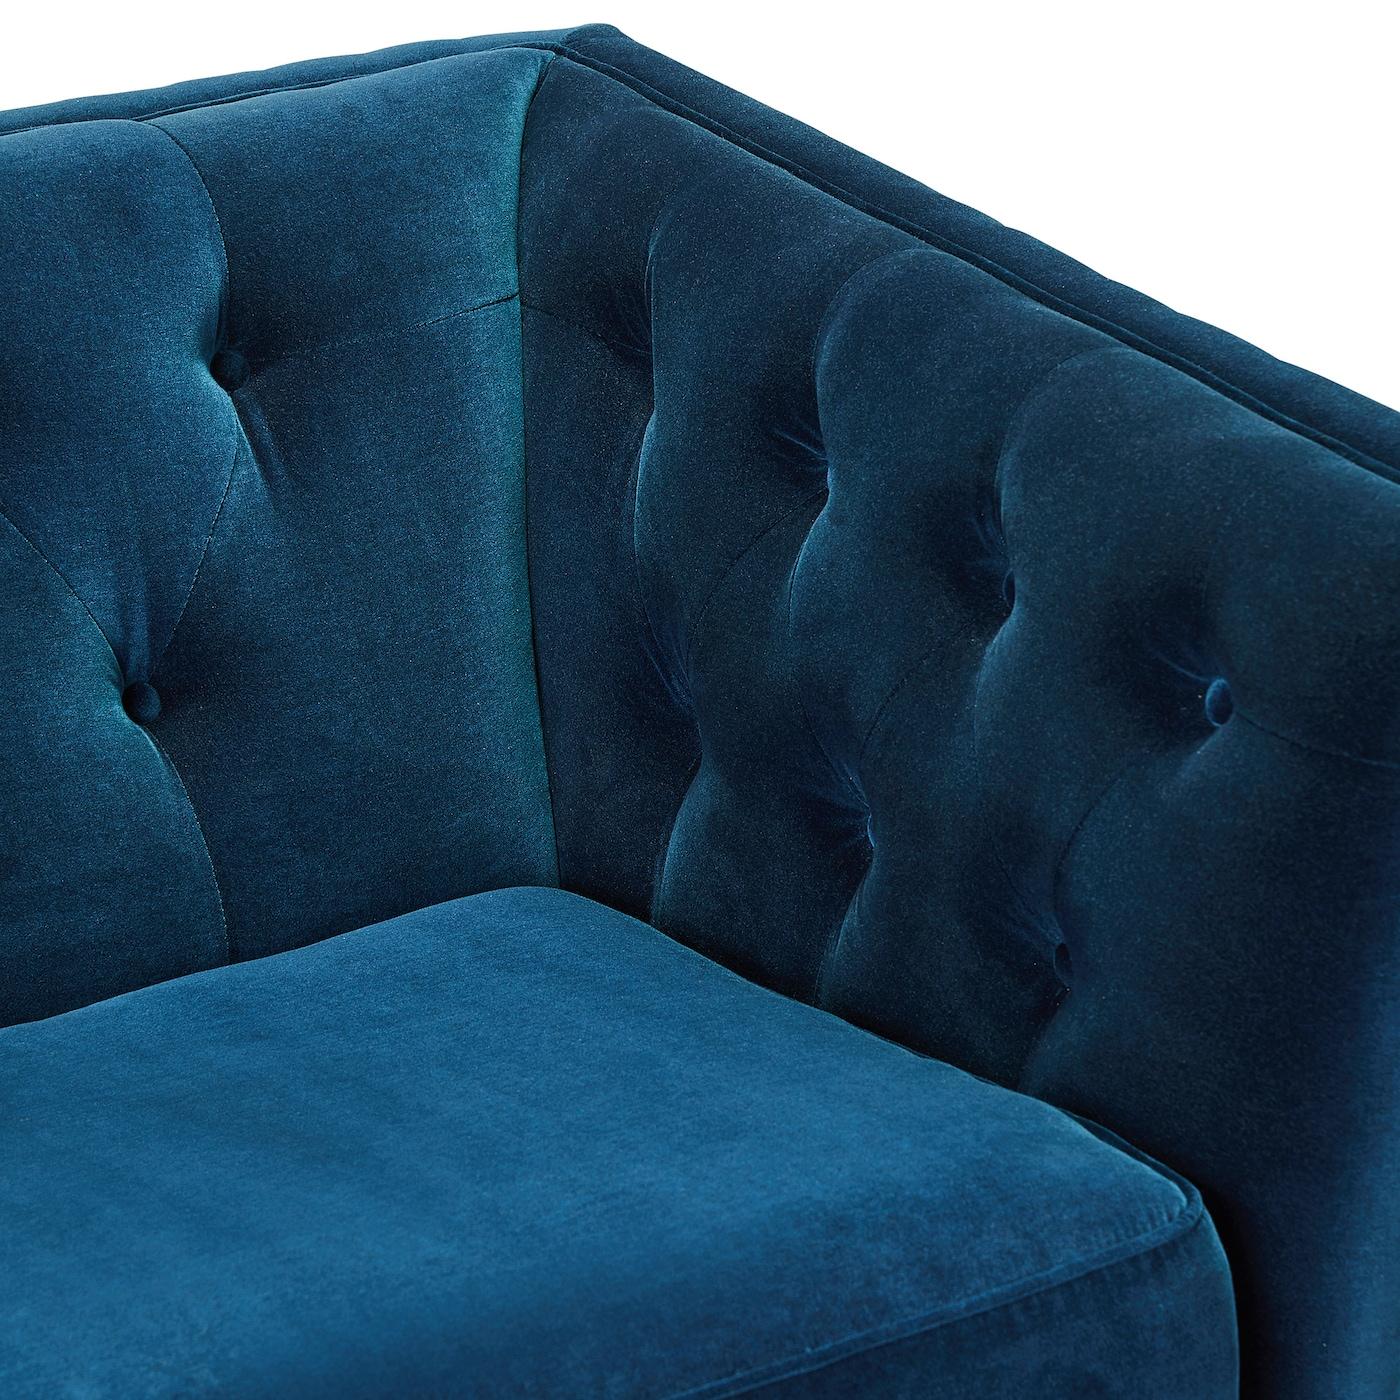 Lindome Sofa Djuparp Dark Green Blue Ikea